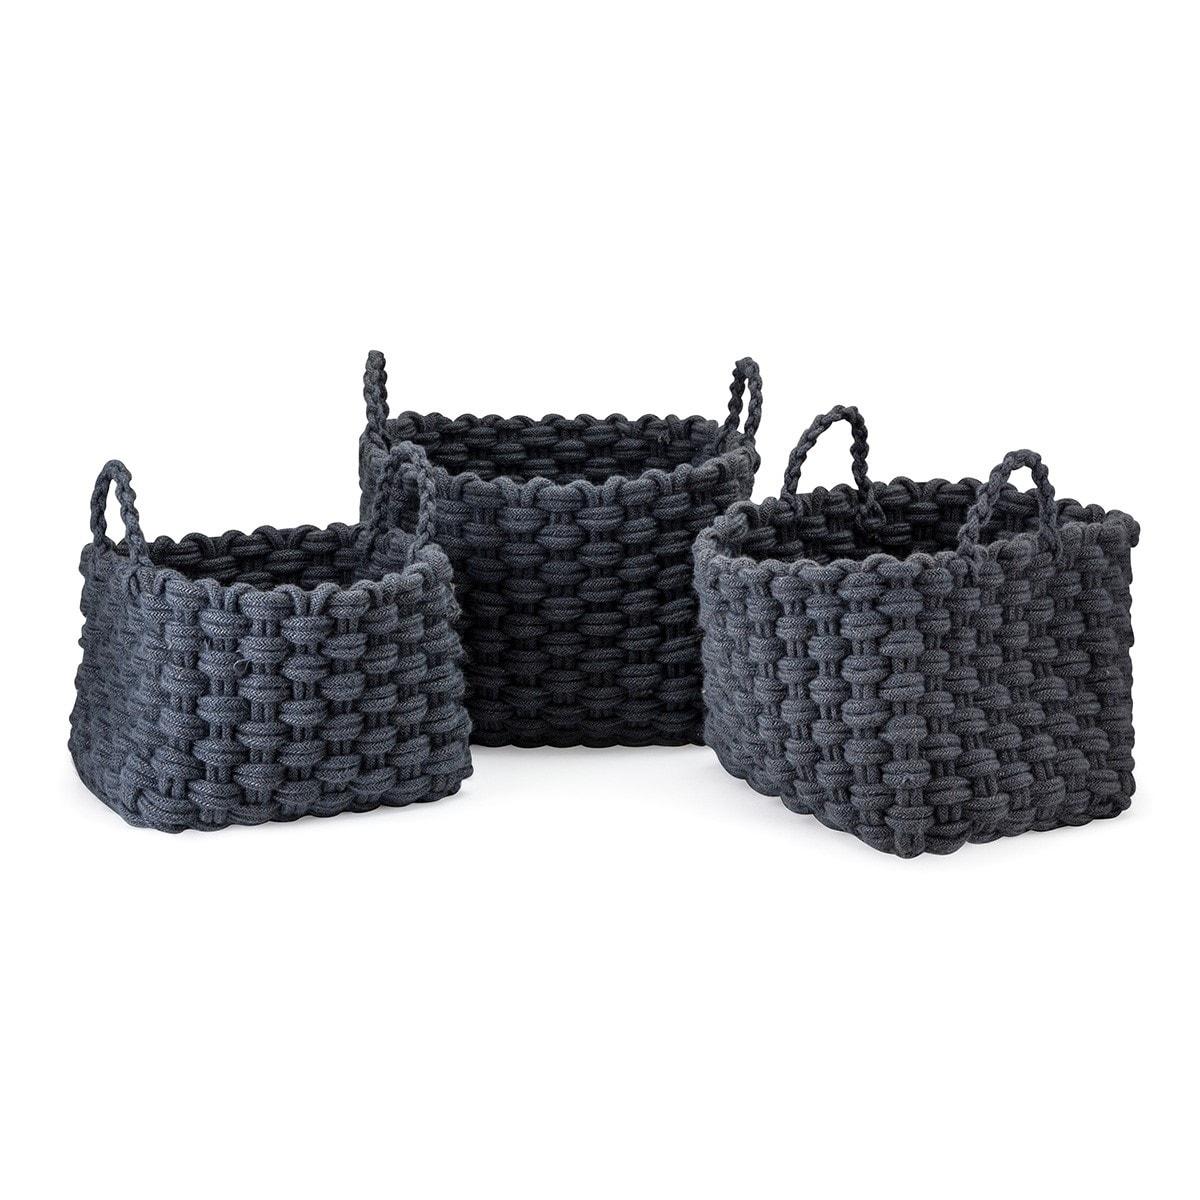 Trisha Yearwood Bluebird Woven Rope Baskets - Set of 3